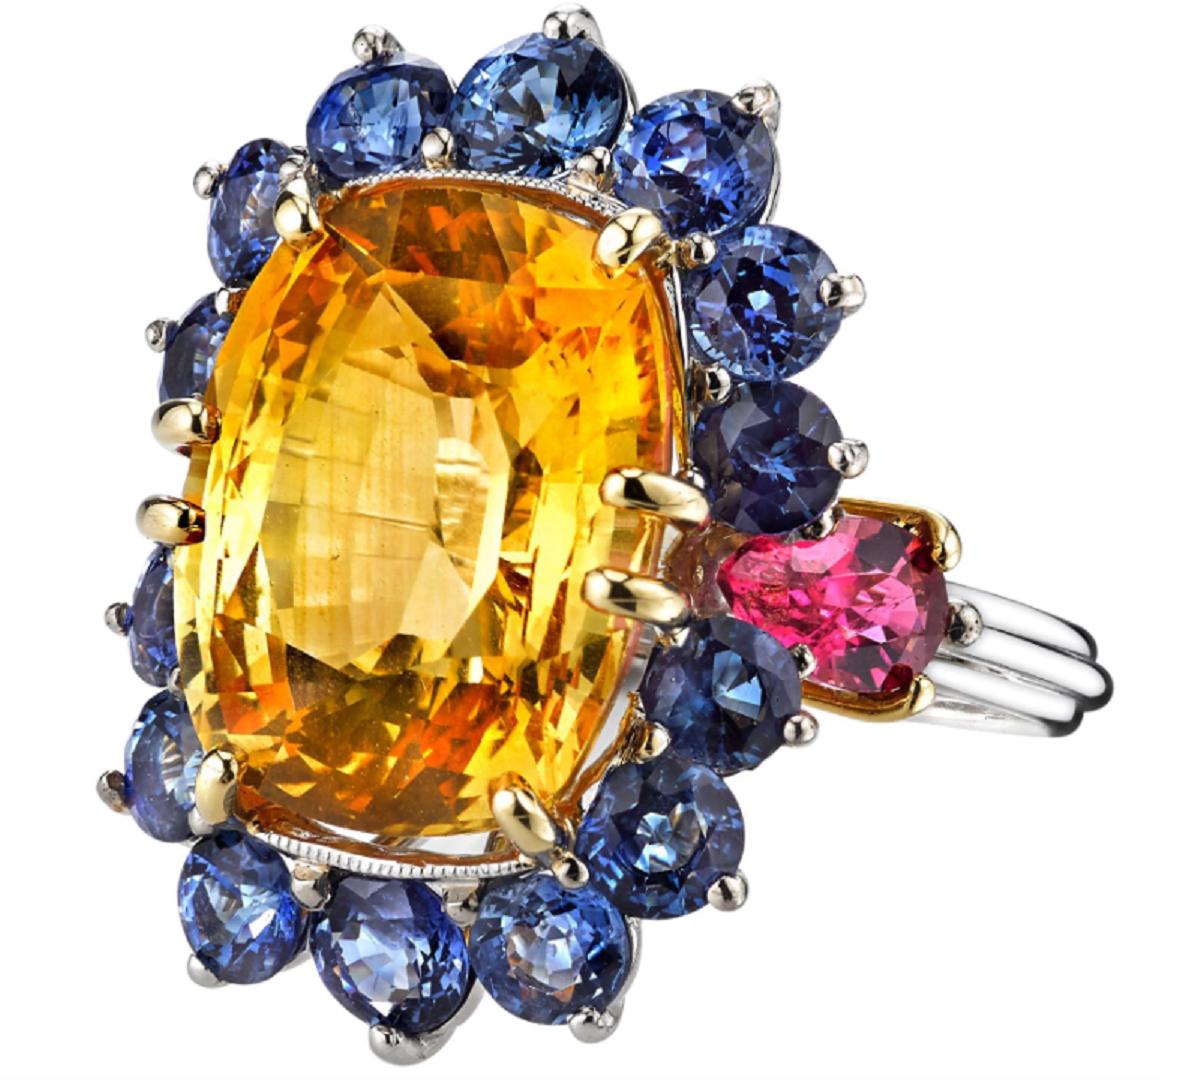 Best massive bling rings 2021 Elegant Yellow Sapphire, Blue Sapphire and Pink Tourmaline Platinum Cluster Diamond Ring